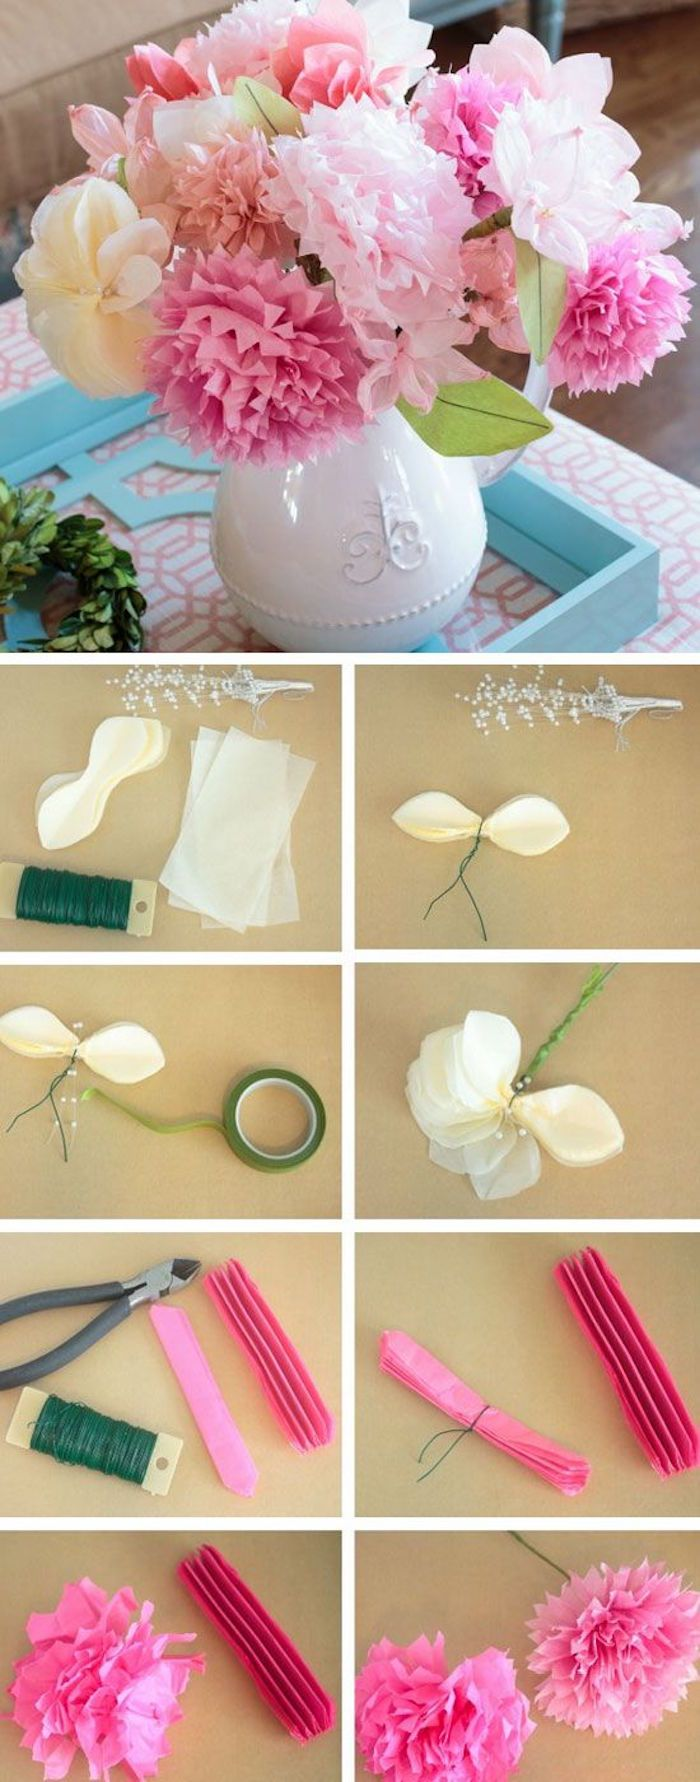 DIY Deko Ideen, mit denen Sie den Frühling nach Hause holen – Meilin Wang